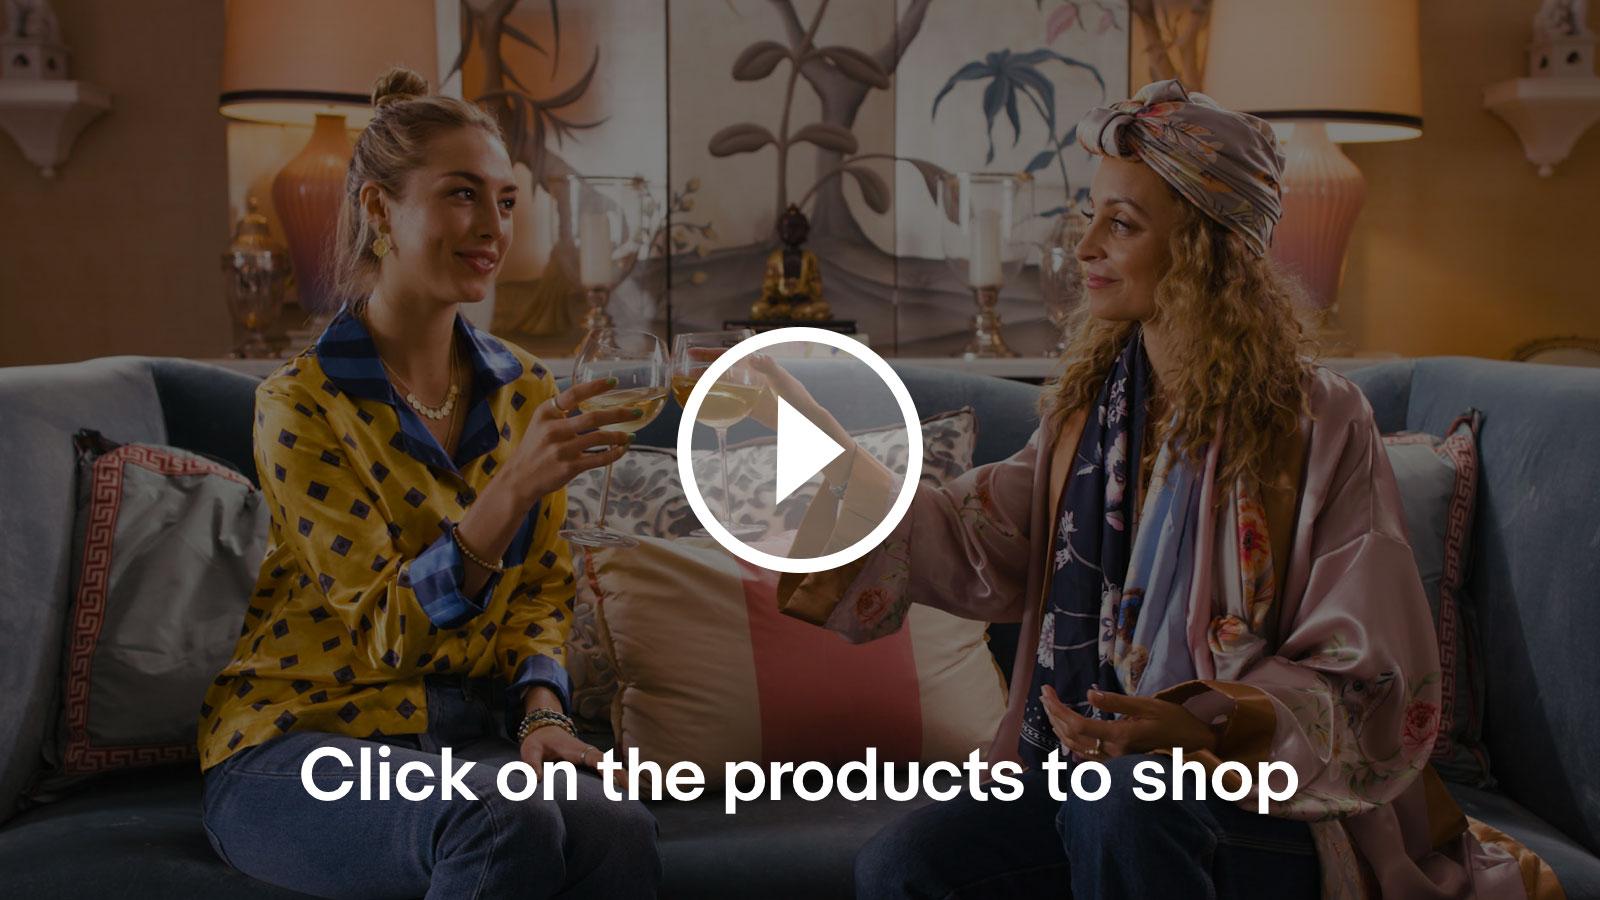 Shop for Nicole Richie's style weapon: Honey Minx scarves